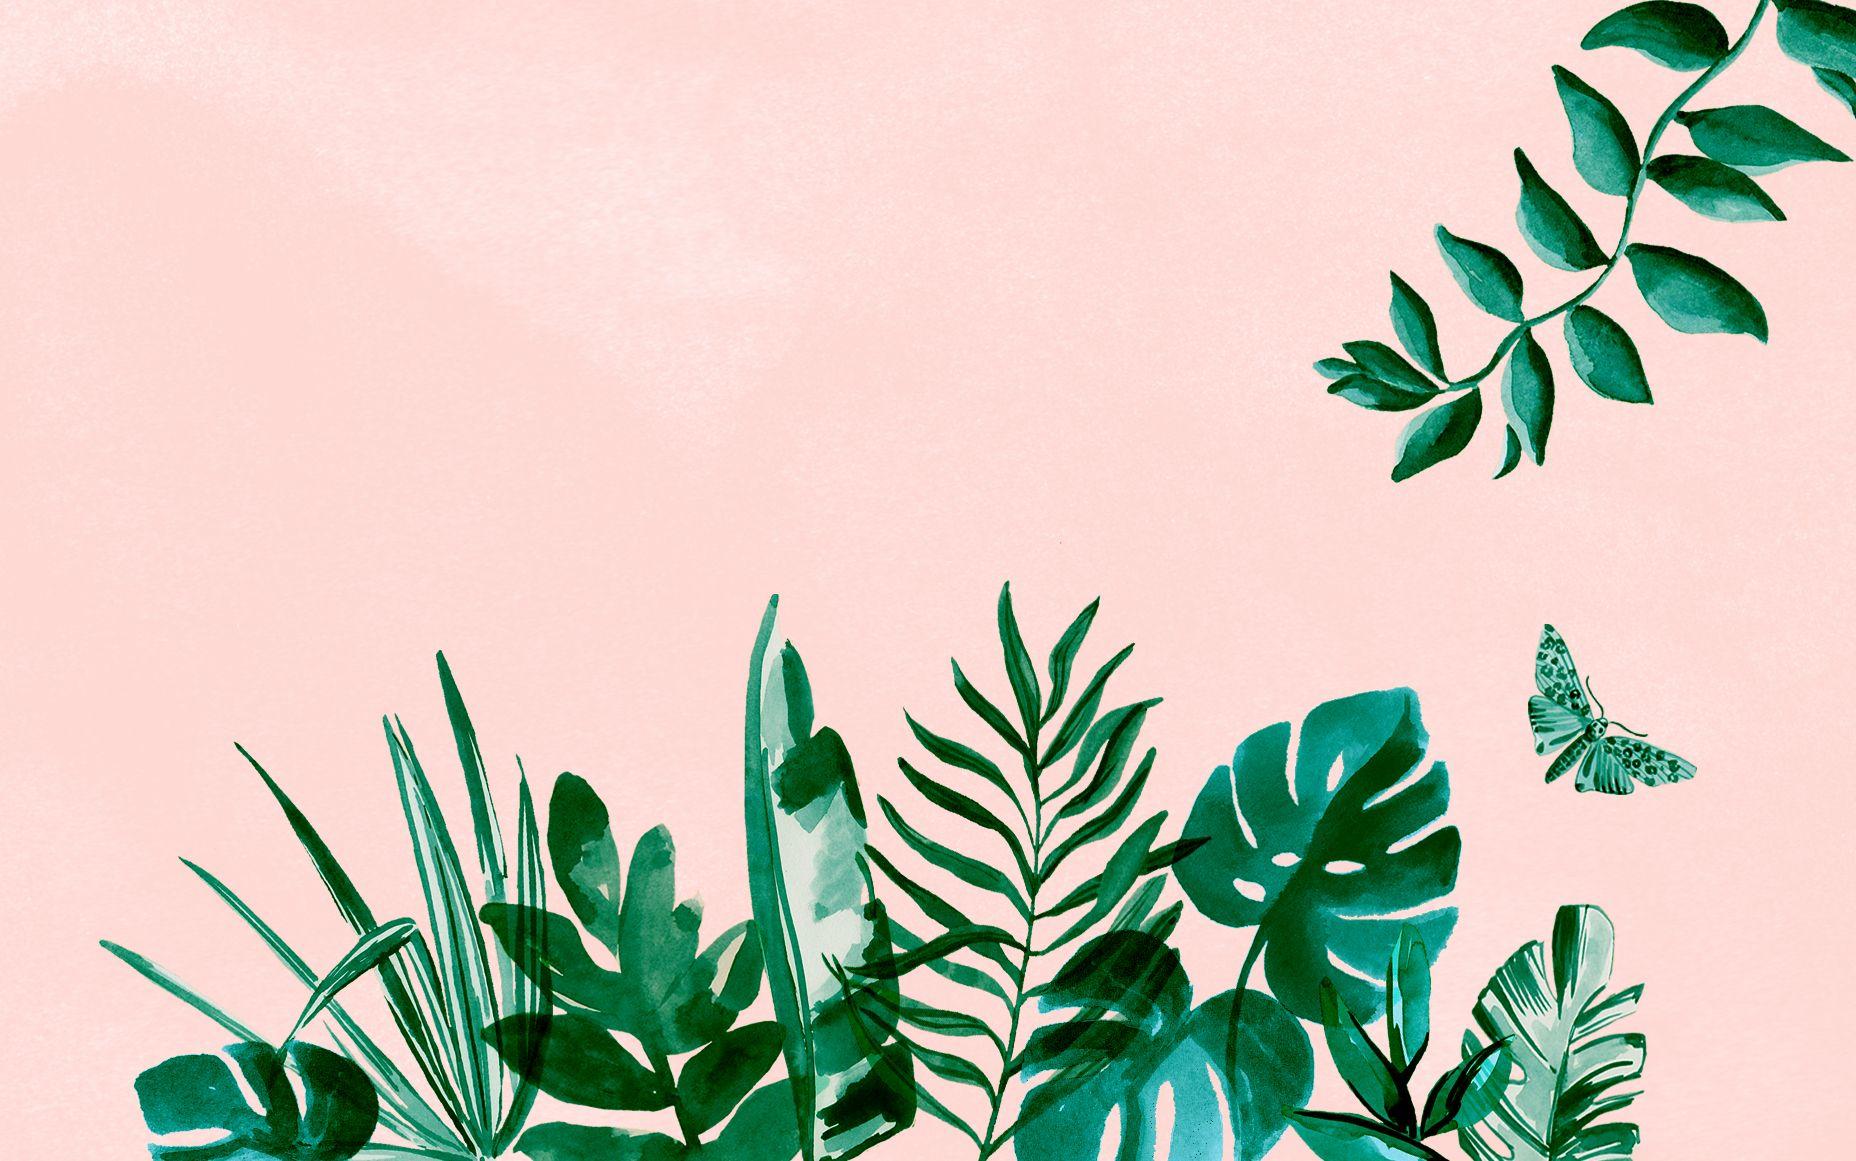 Desktop Tropical Leaf Wallpaper Tropical palm leaf wallpaper (24+ images). desktop tropical leaf wallpaper